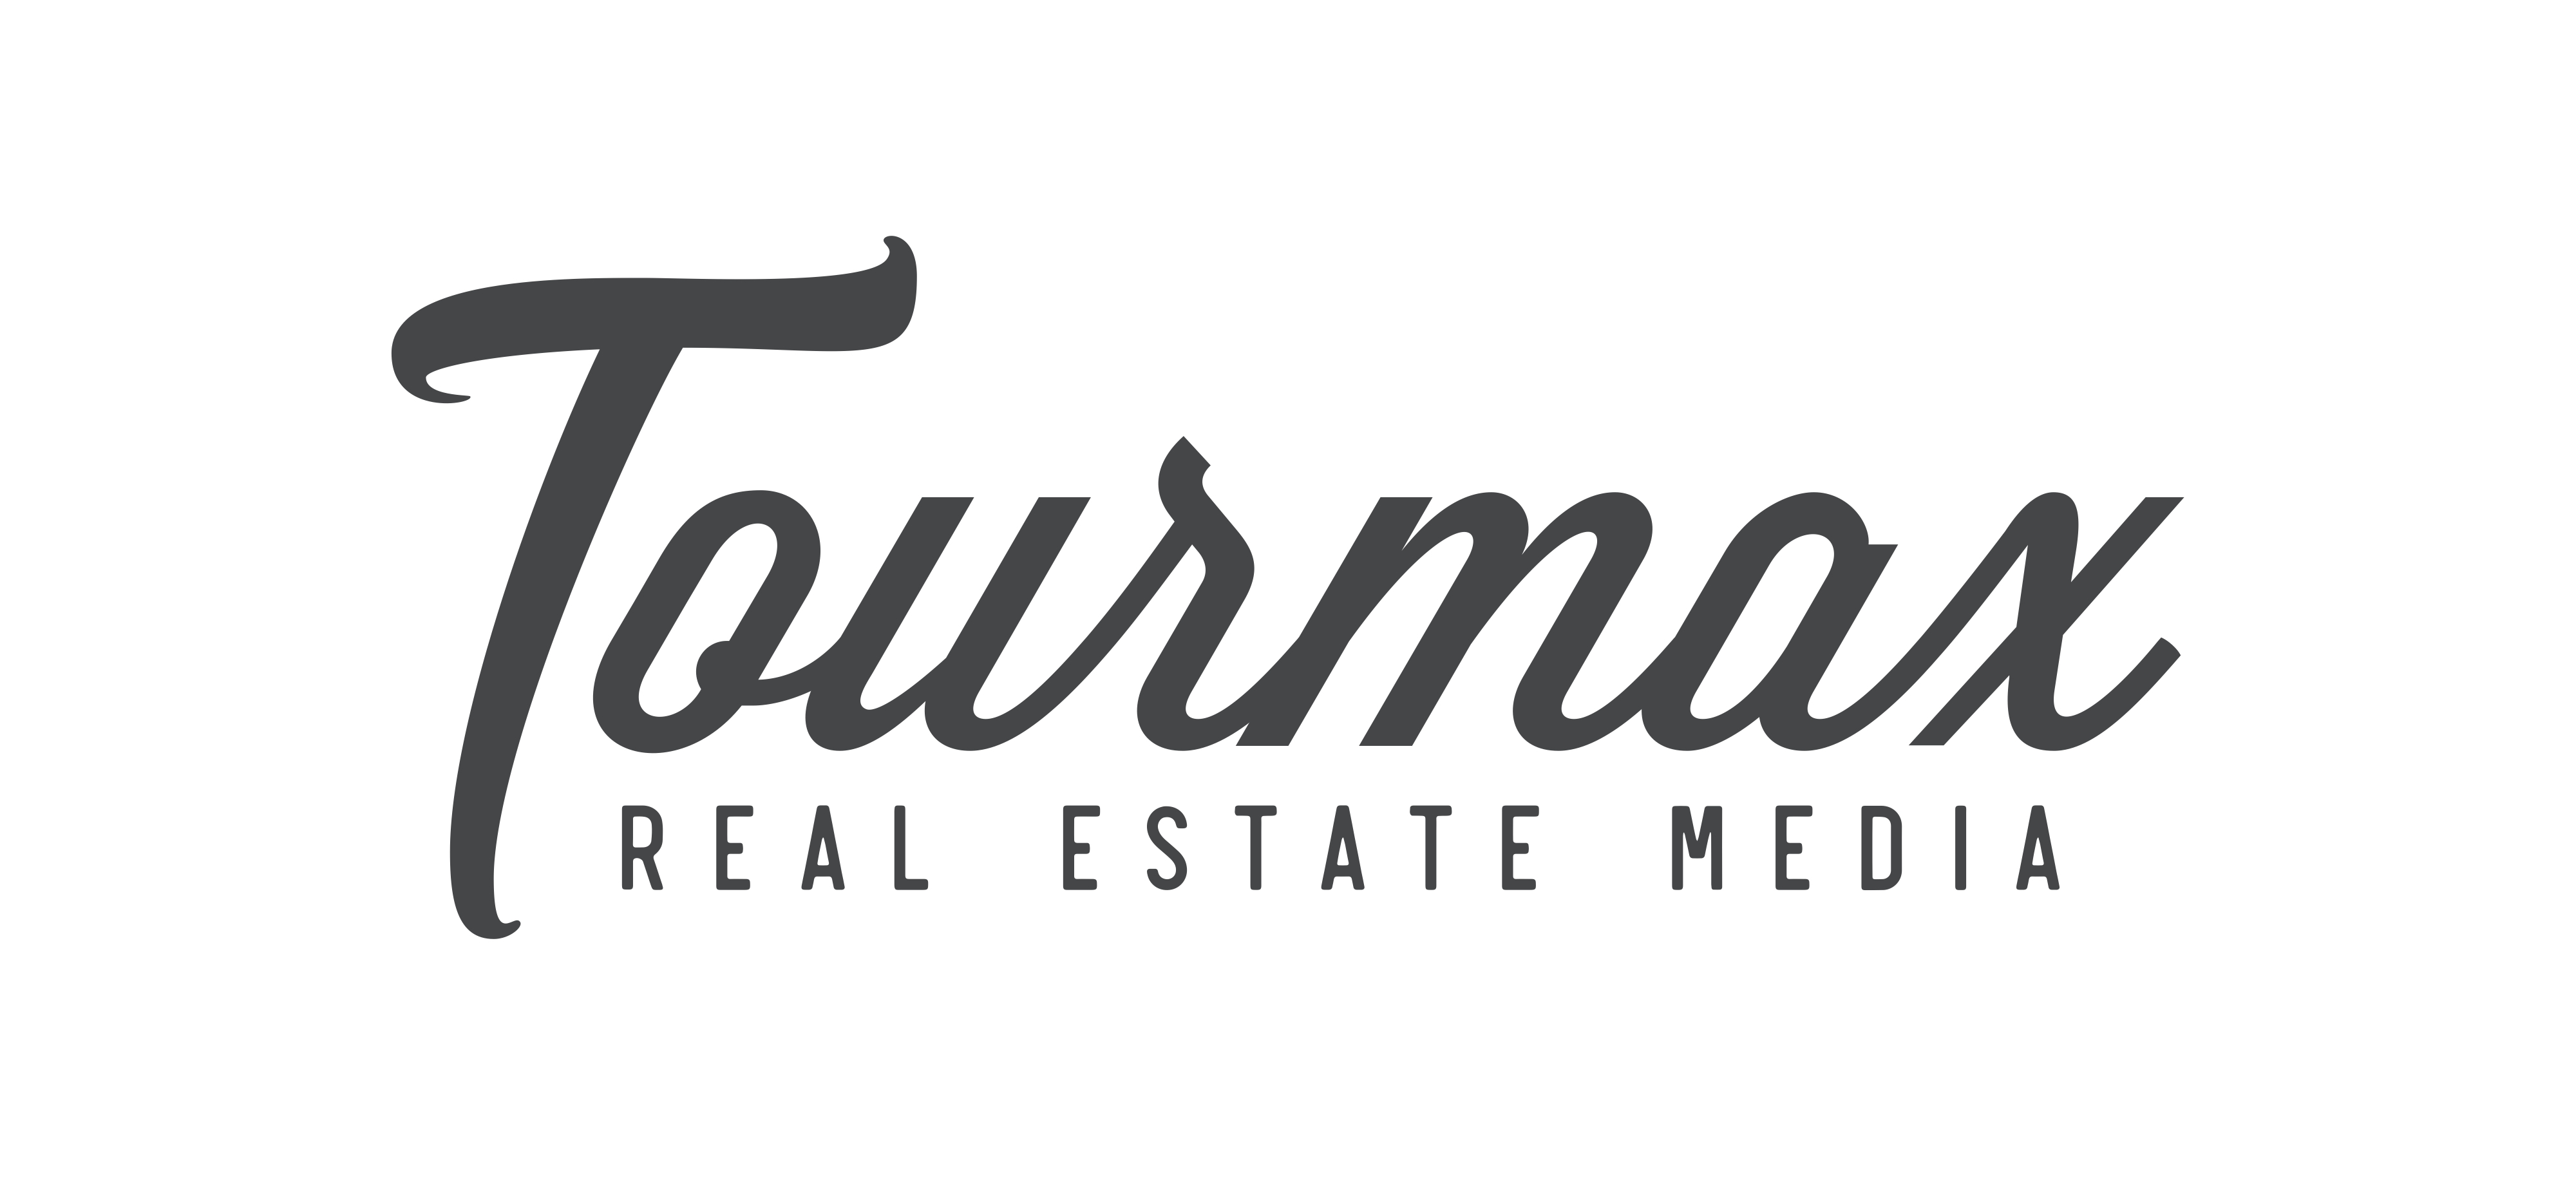 Tourmax Real Estate Media floor plan Dallas